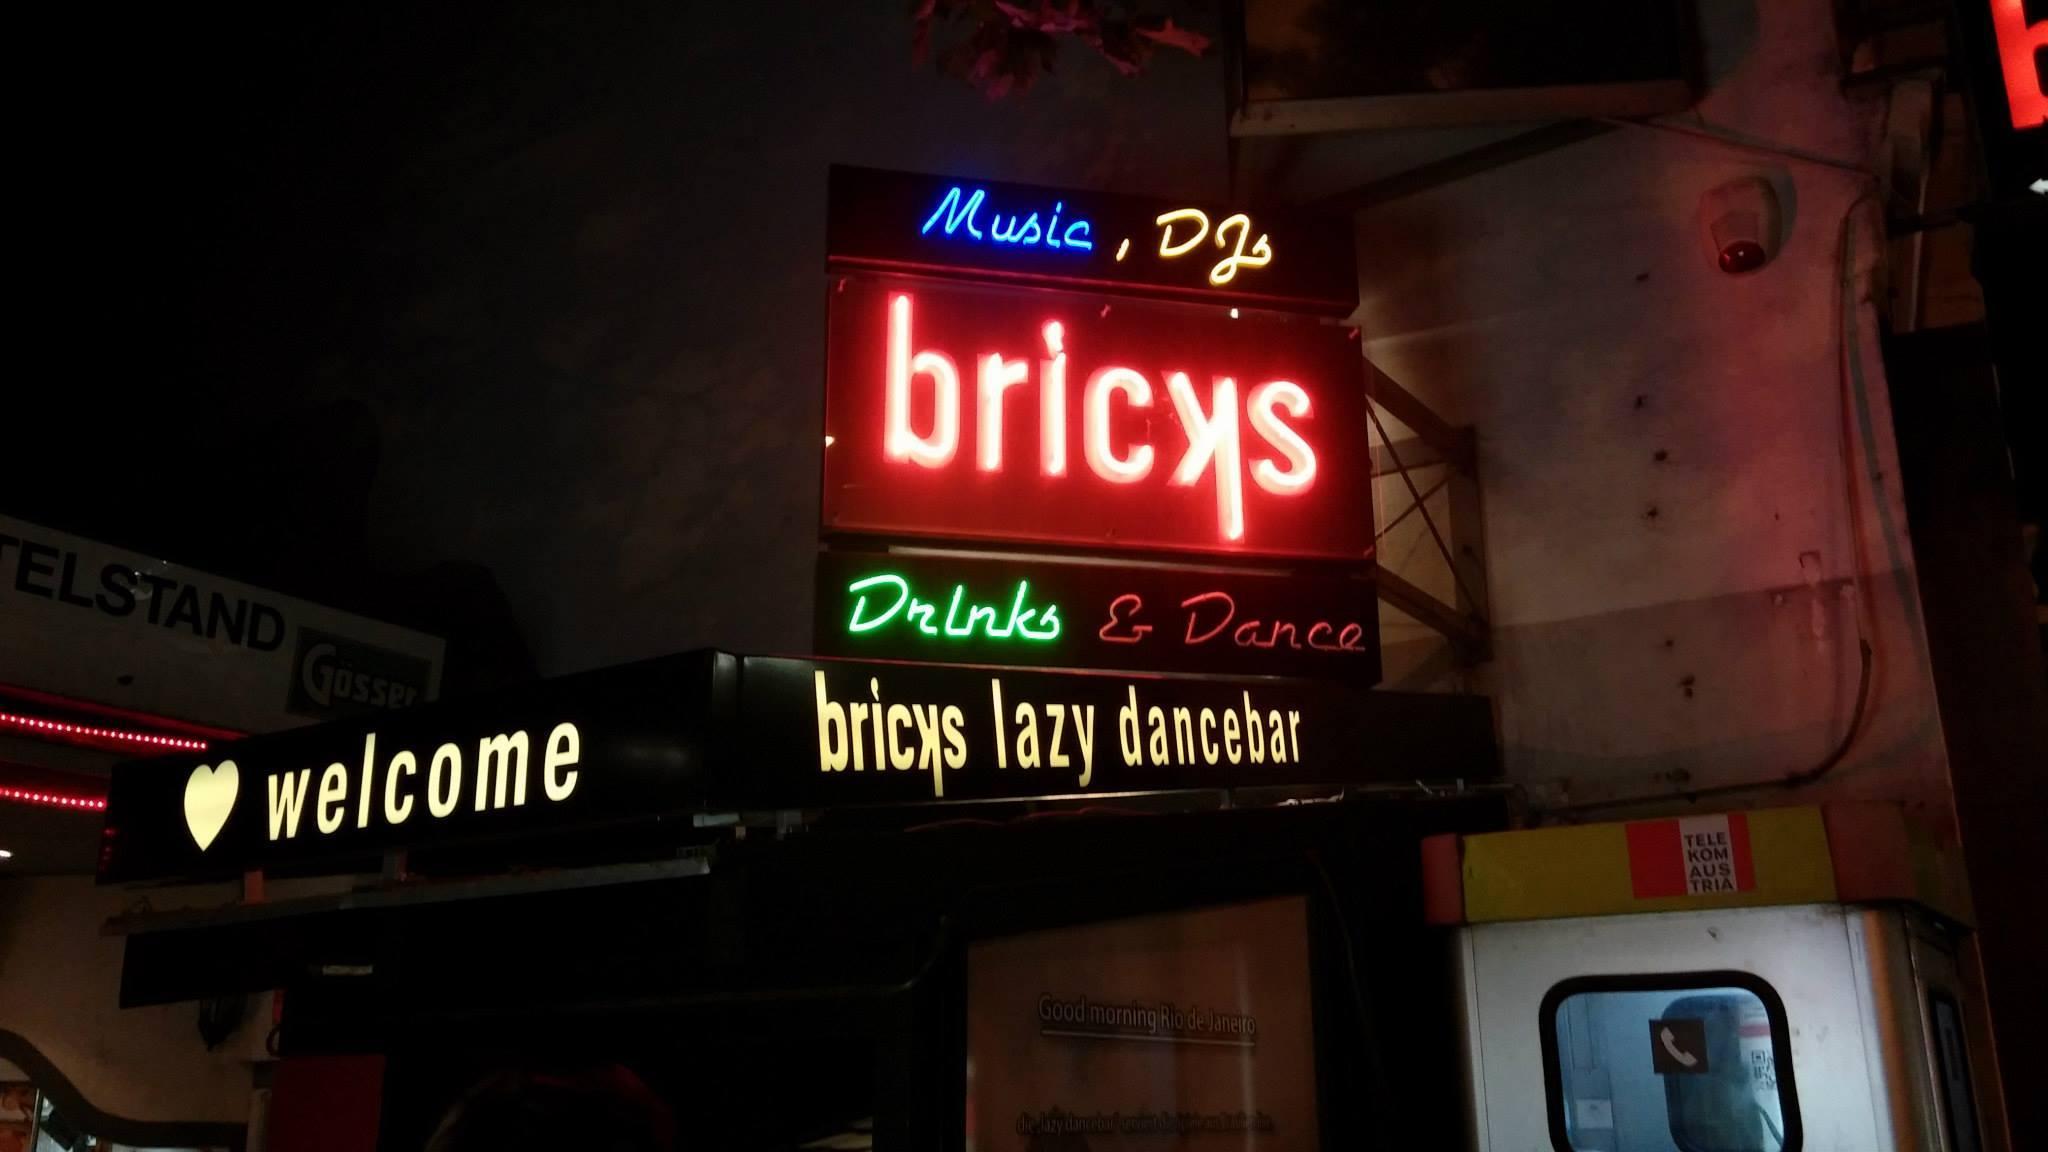 7.8.14 Vienna, Austria-Hanging at Bricks Lazy Dance after match  (1)-001.jpg